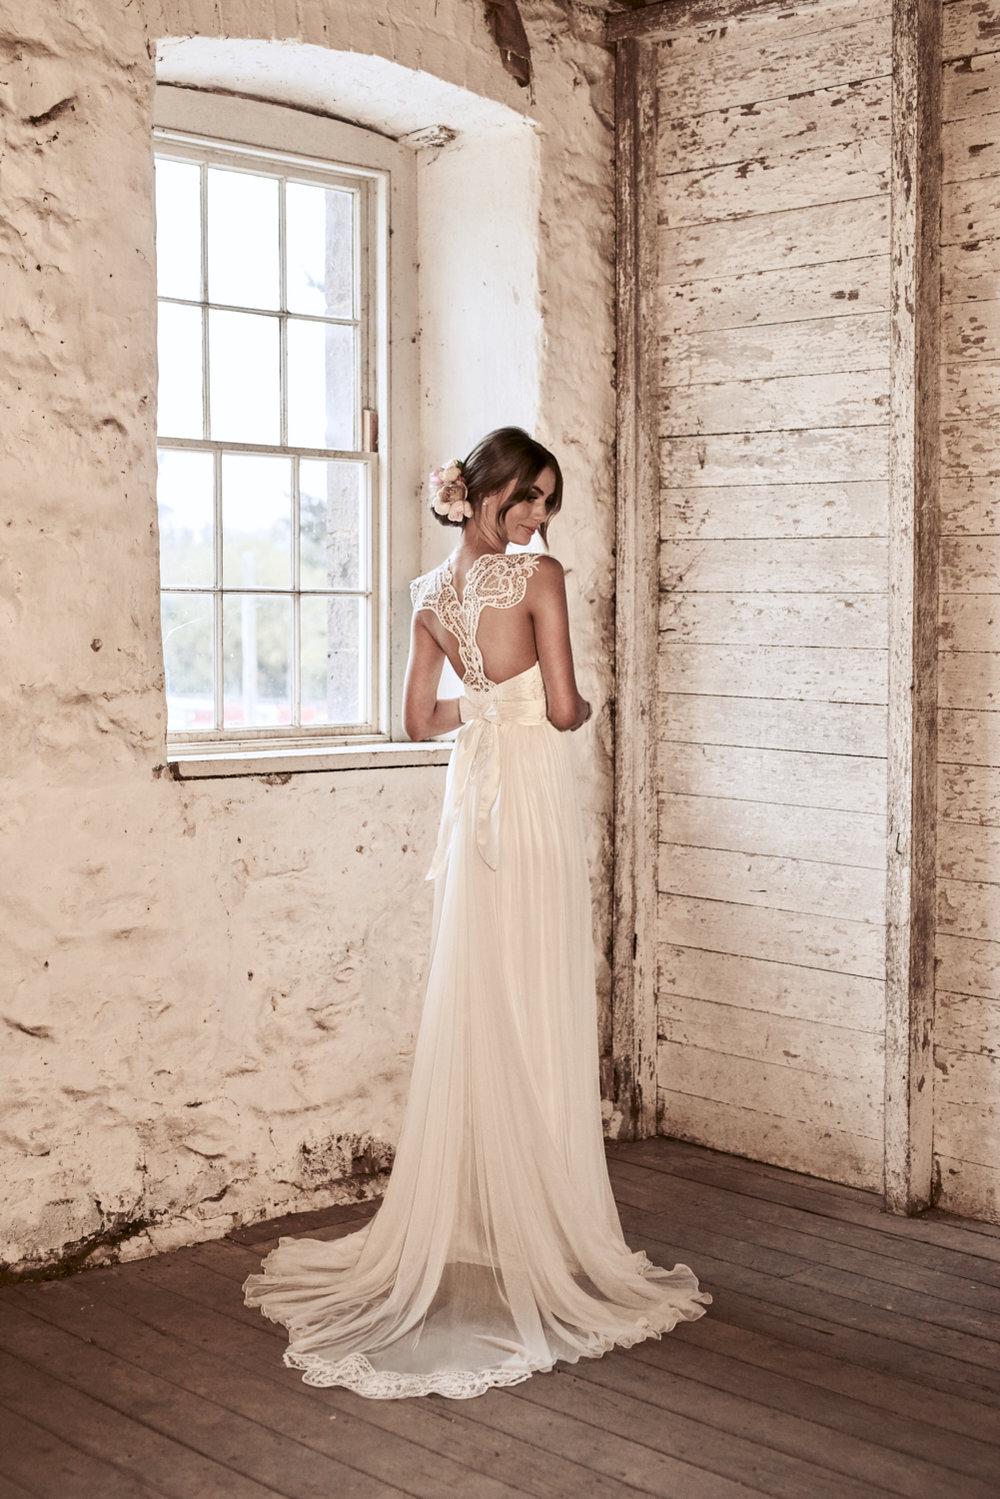 Eleanor-Dress_SilkTulle_Eternal-Heart-Collection-2.jpg